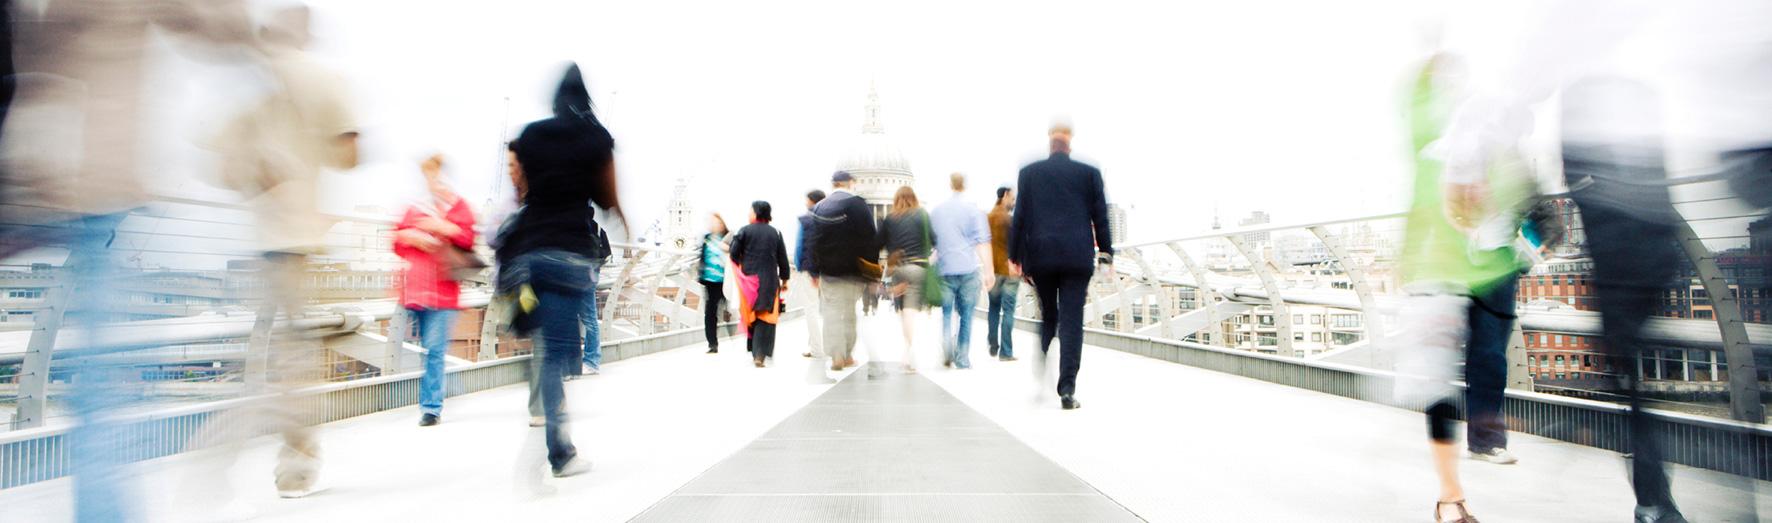 Research, Doctoral College, case studies, student and alumni profiles, people walking, blurred, bridge